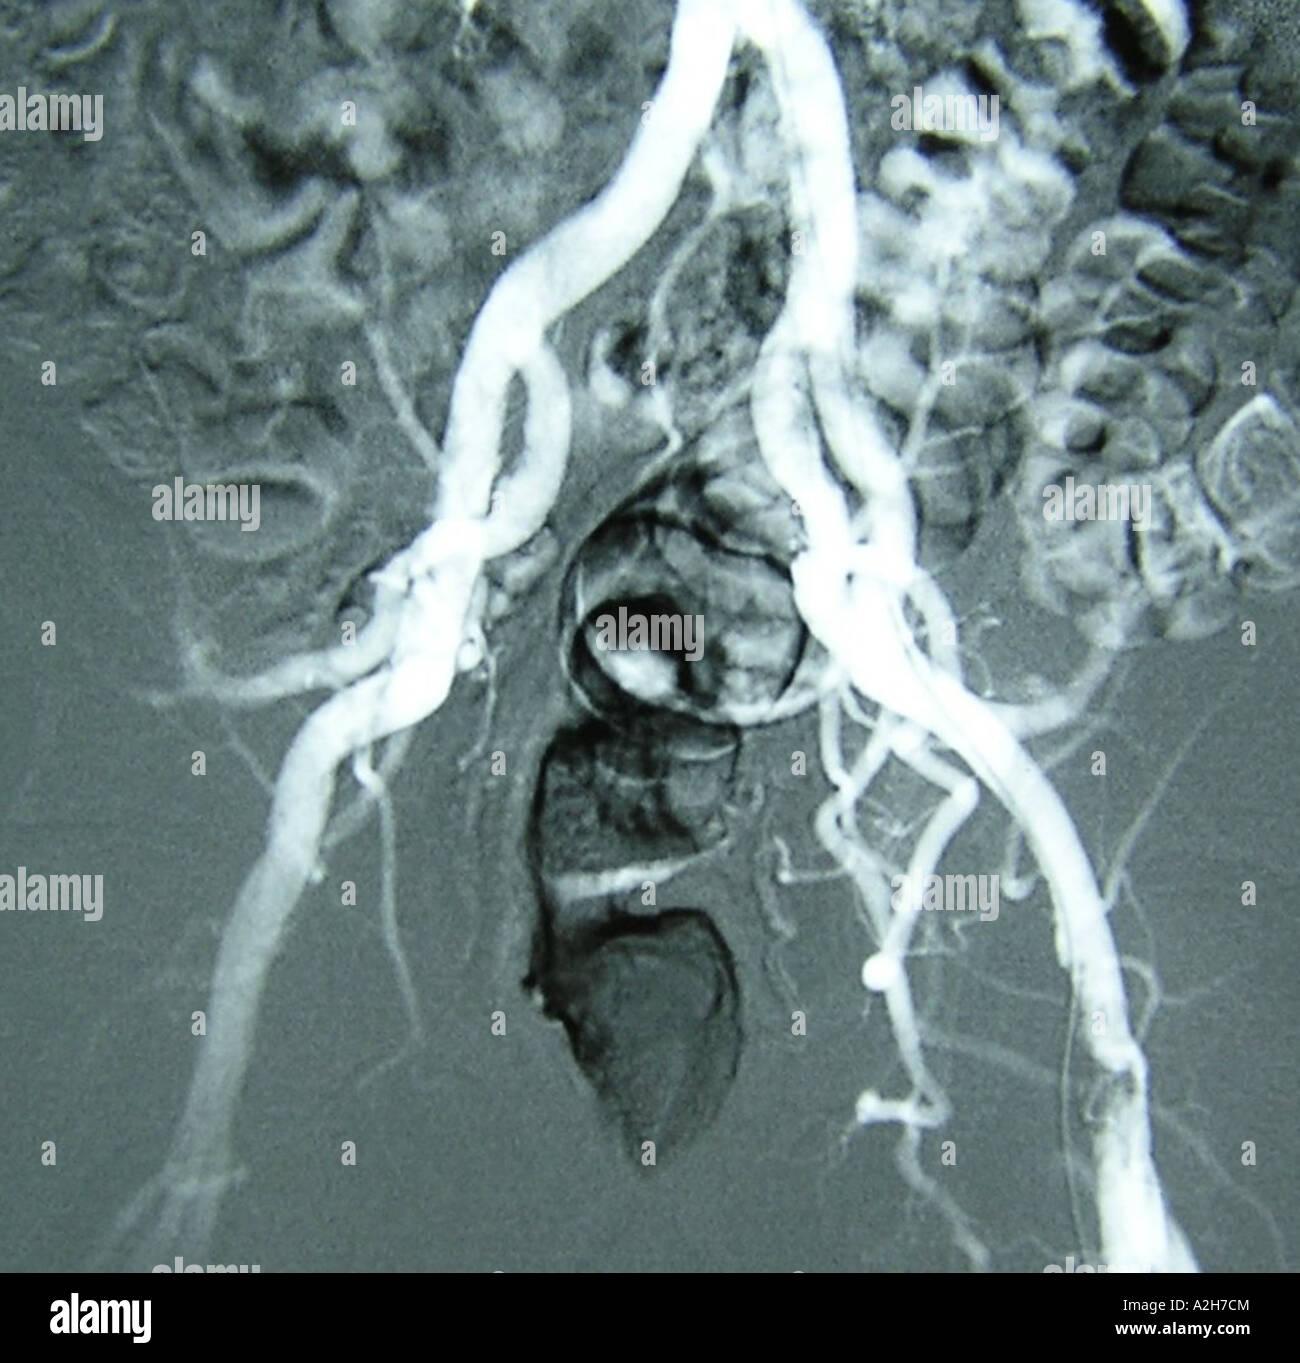 Intestines Image - Stock Image